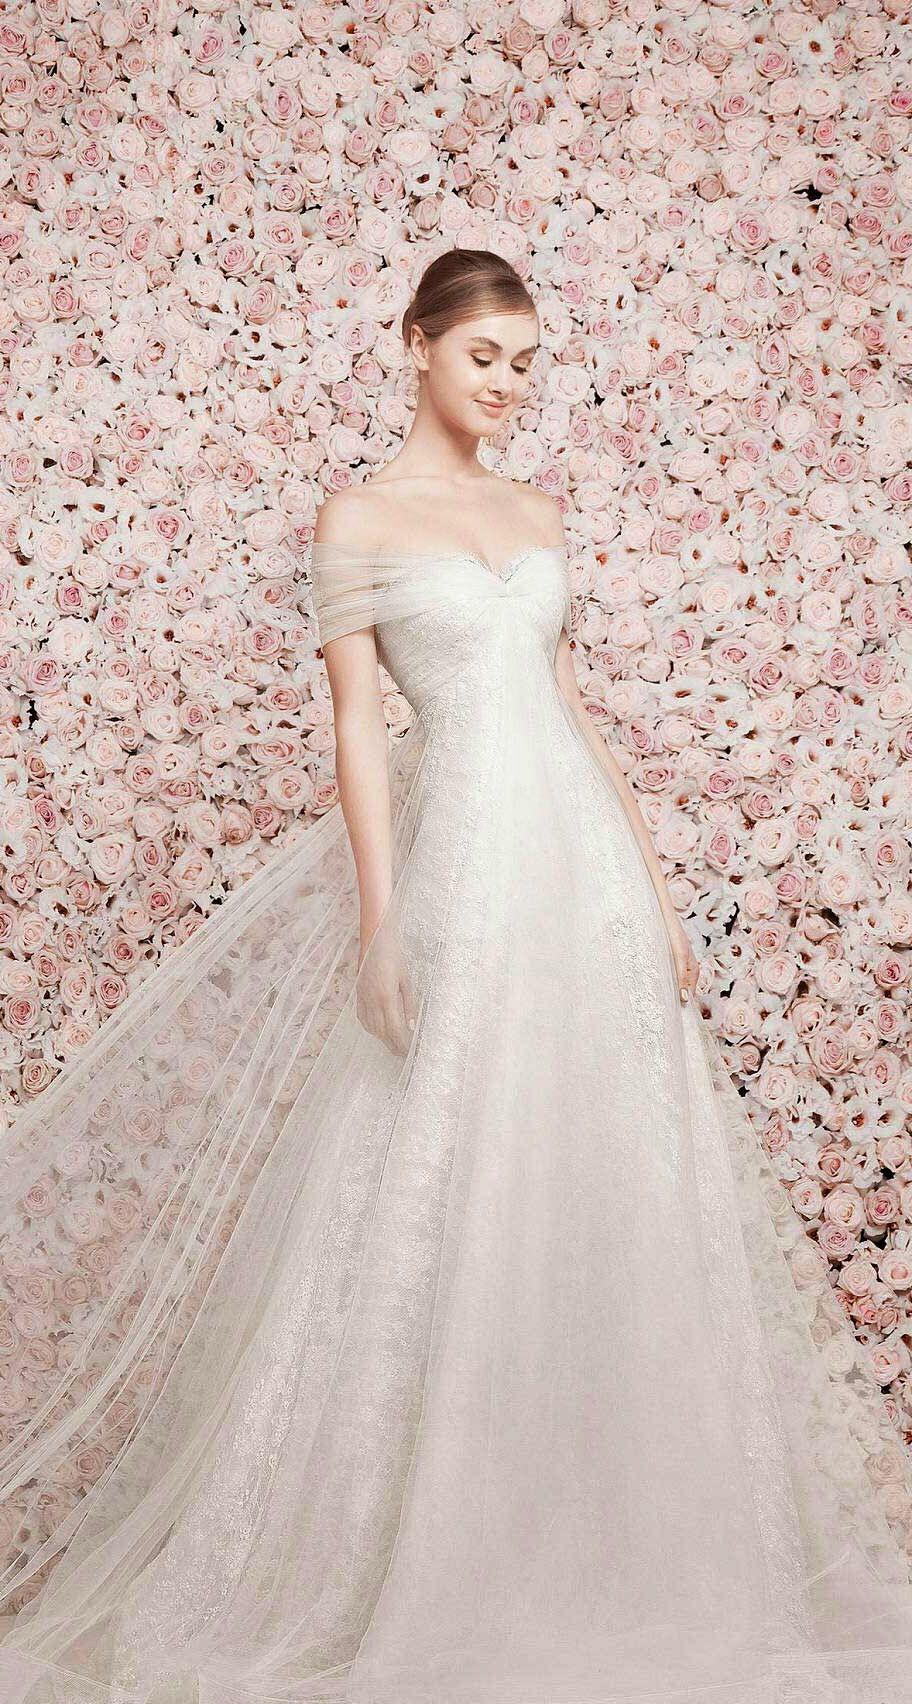 Nice dress | Wedding stuff | Pinterest | Nice dresses, Wedding stuff ...